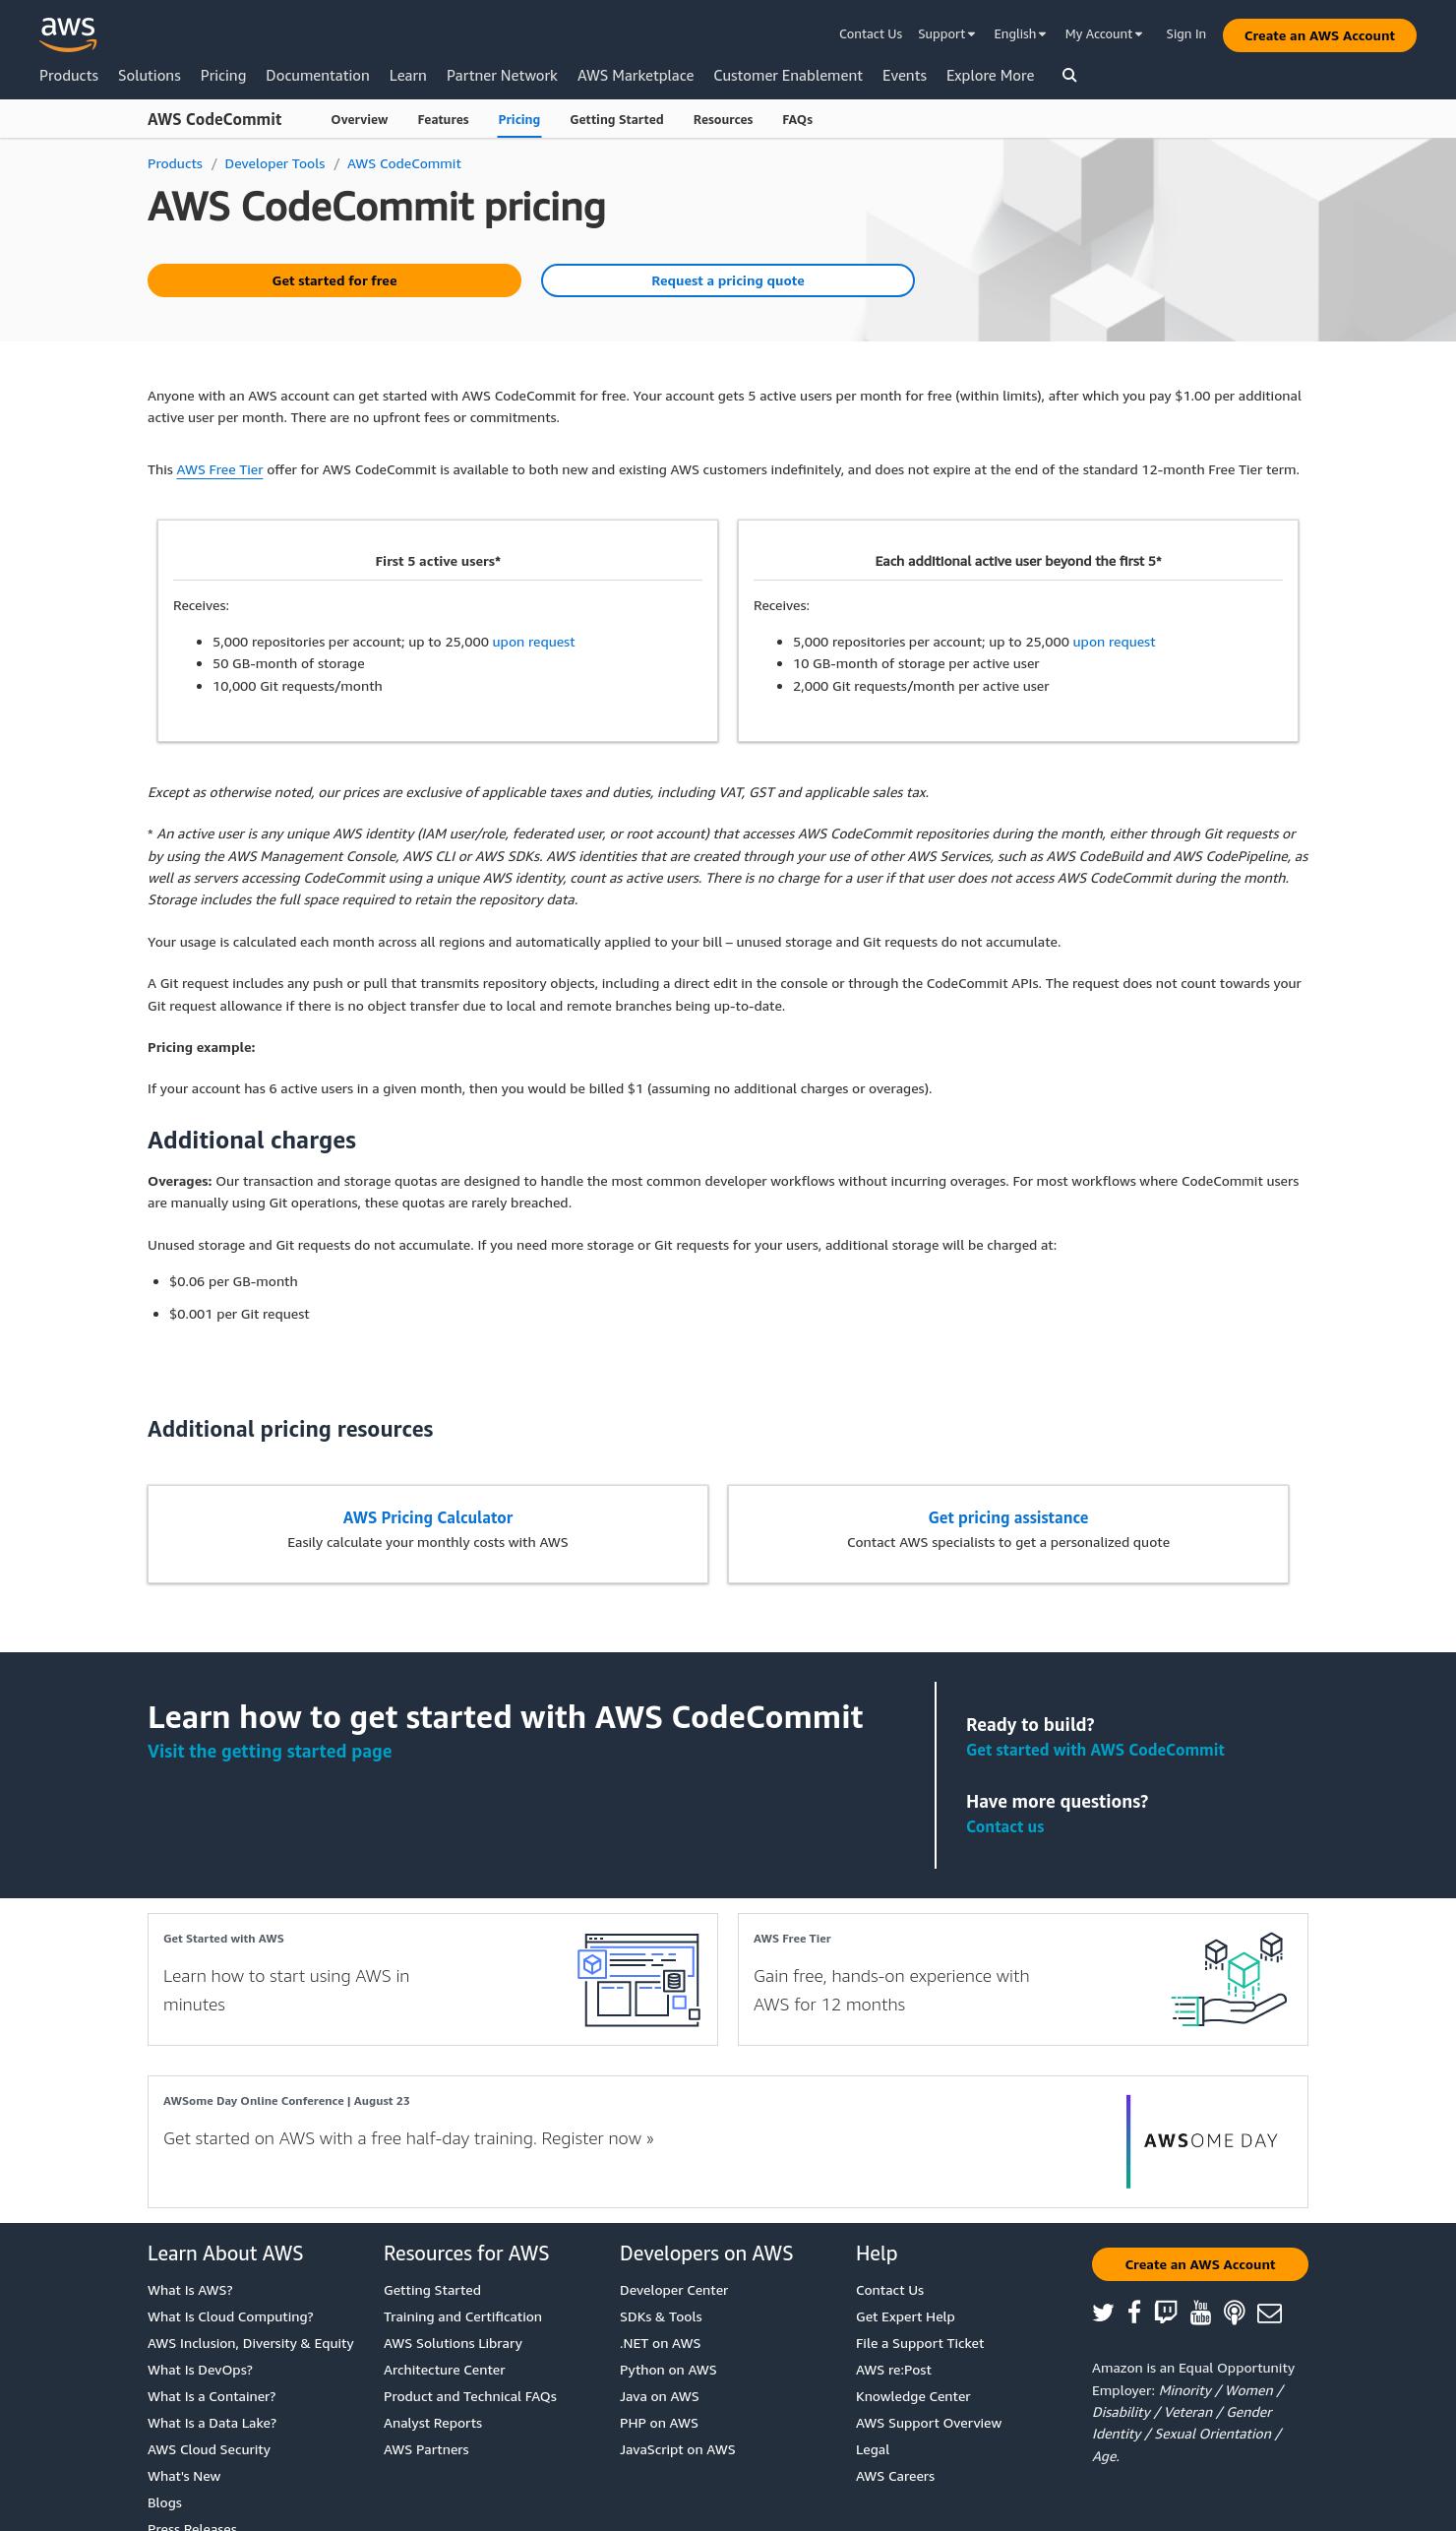 AWS CodeCommit vs BinTray vs Perforce 2018 Comparison of